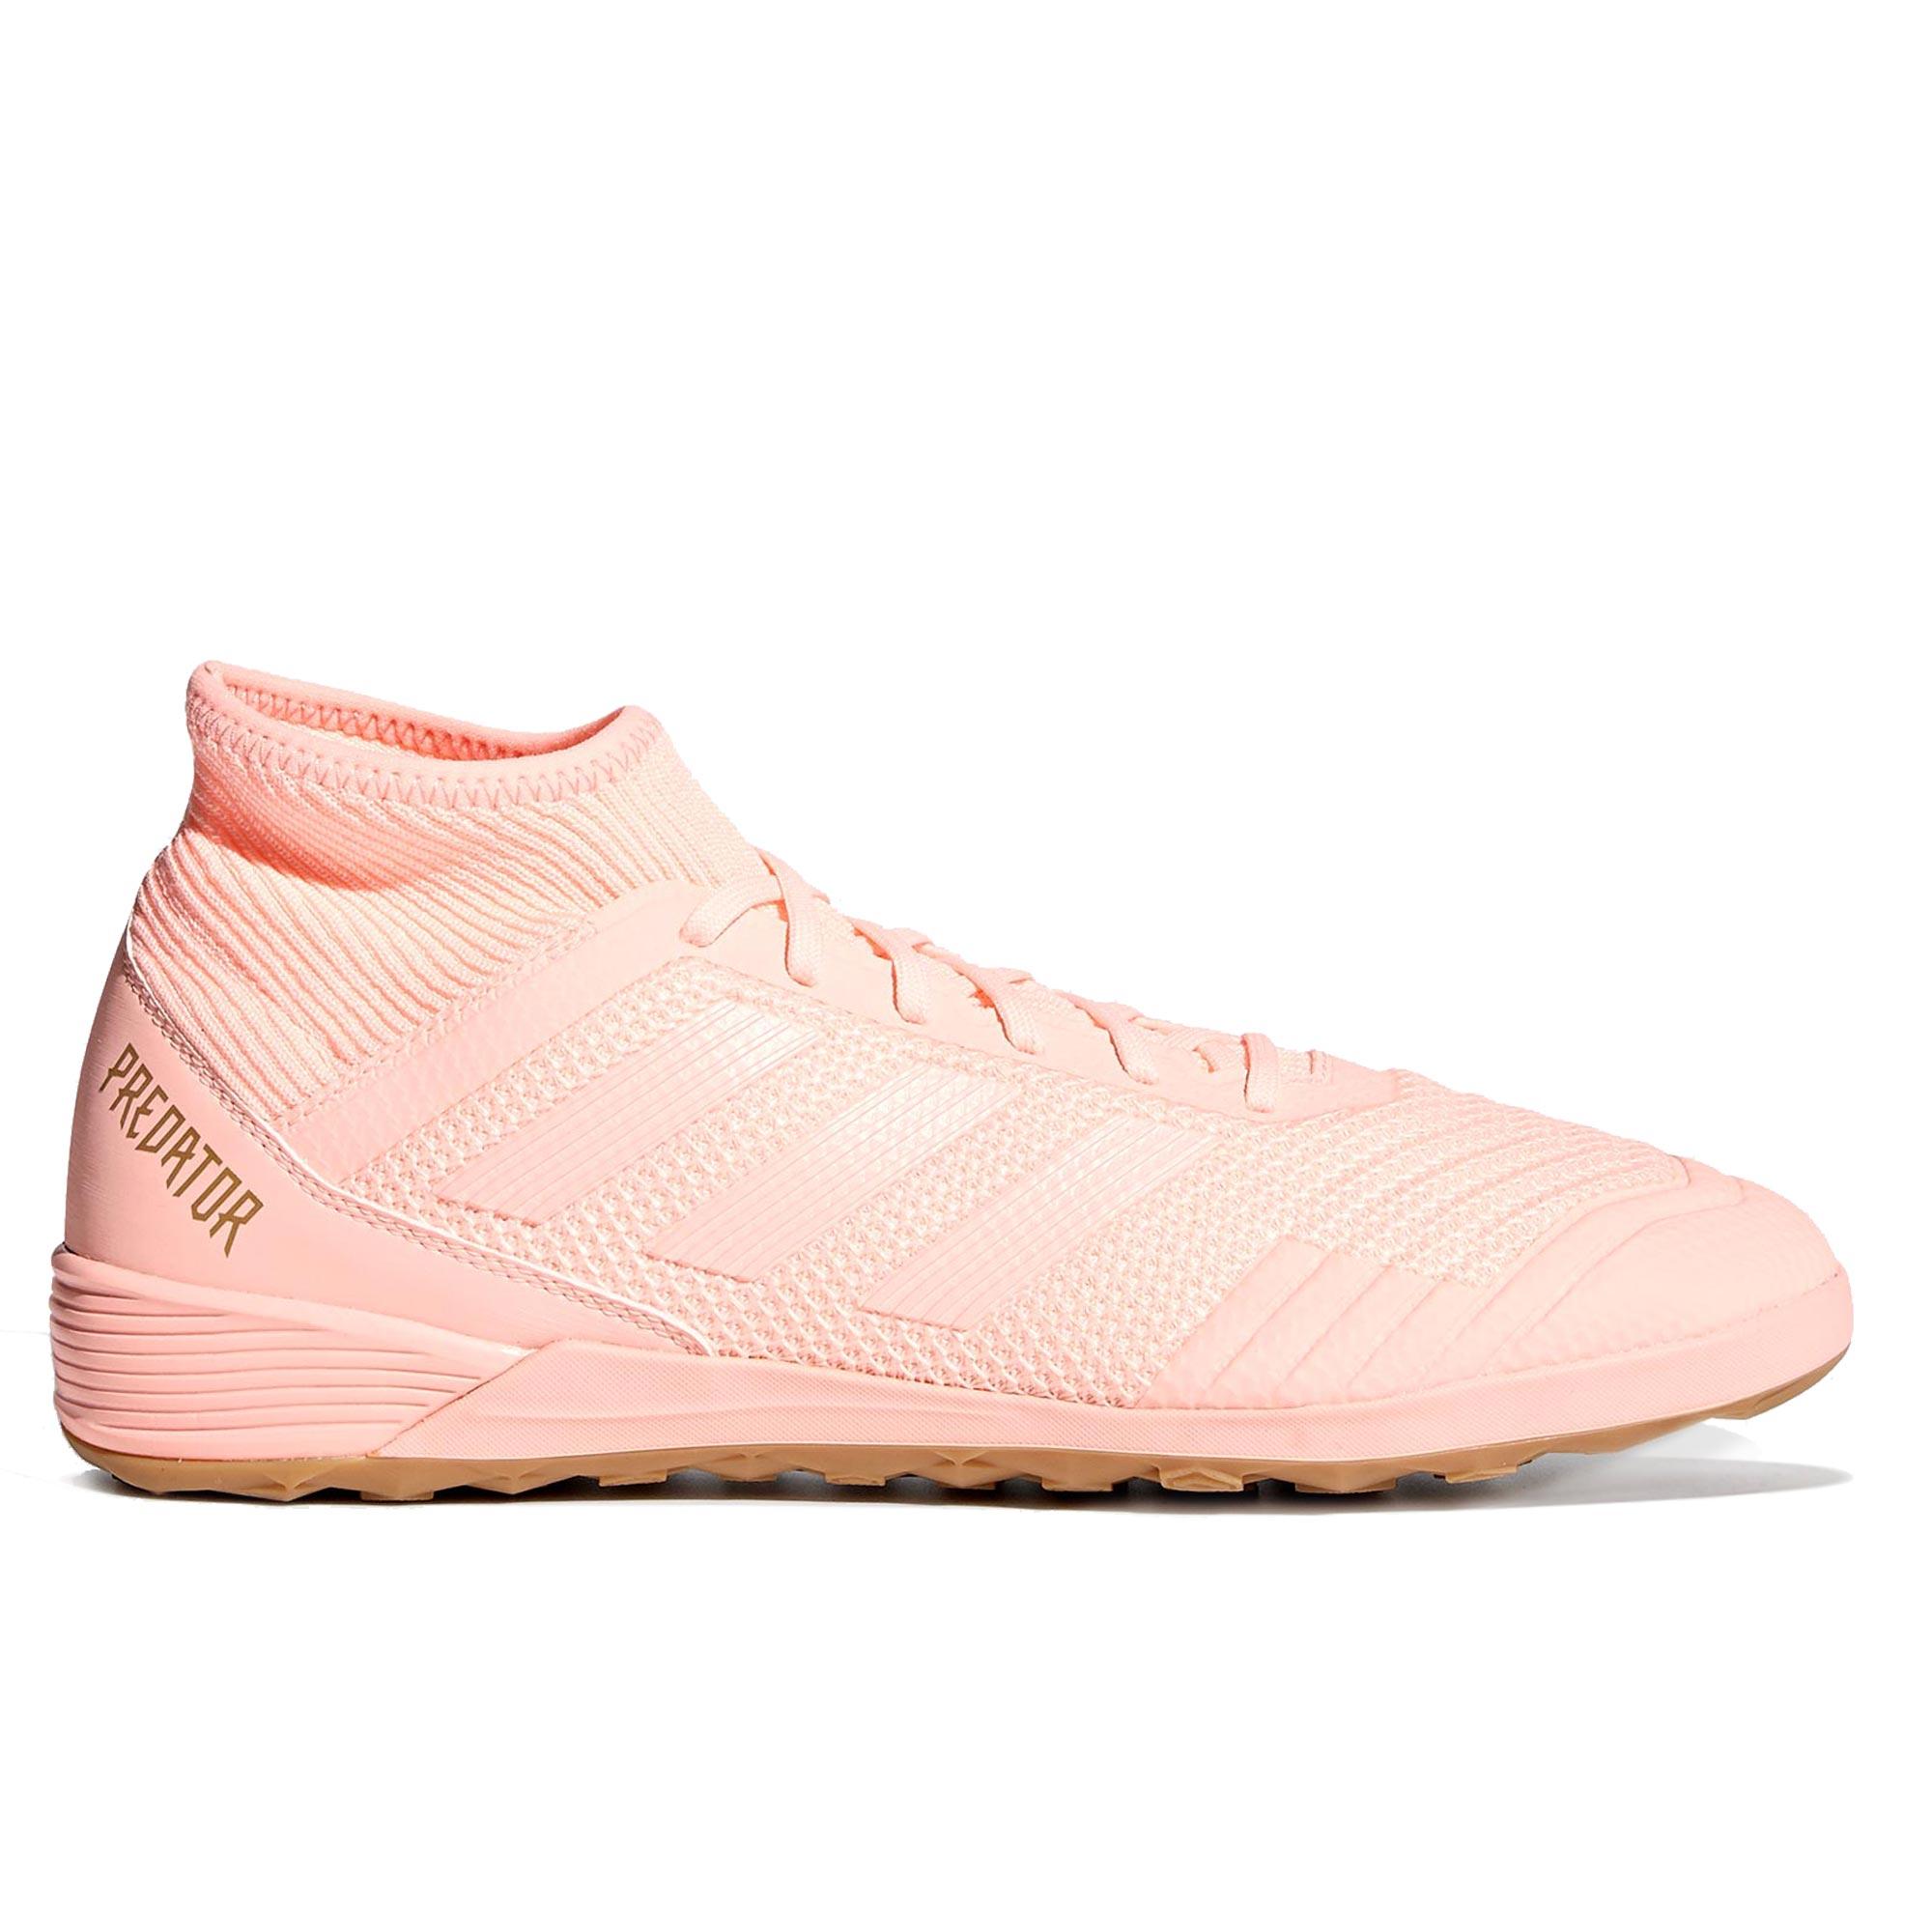 Adidas Predator Tango 18.3 Indoor Trainers - Orange